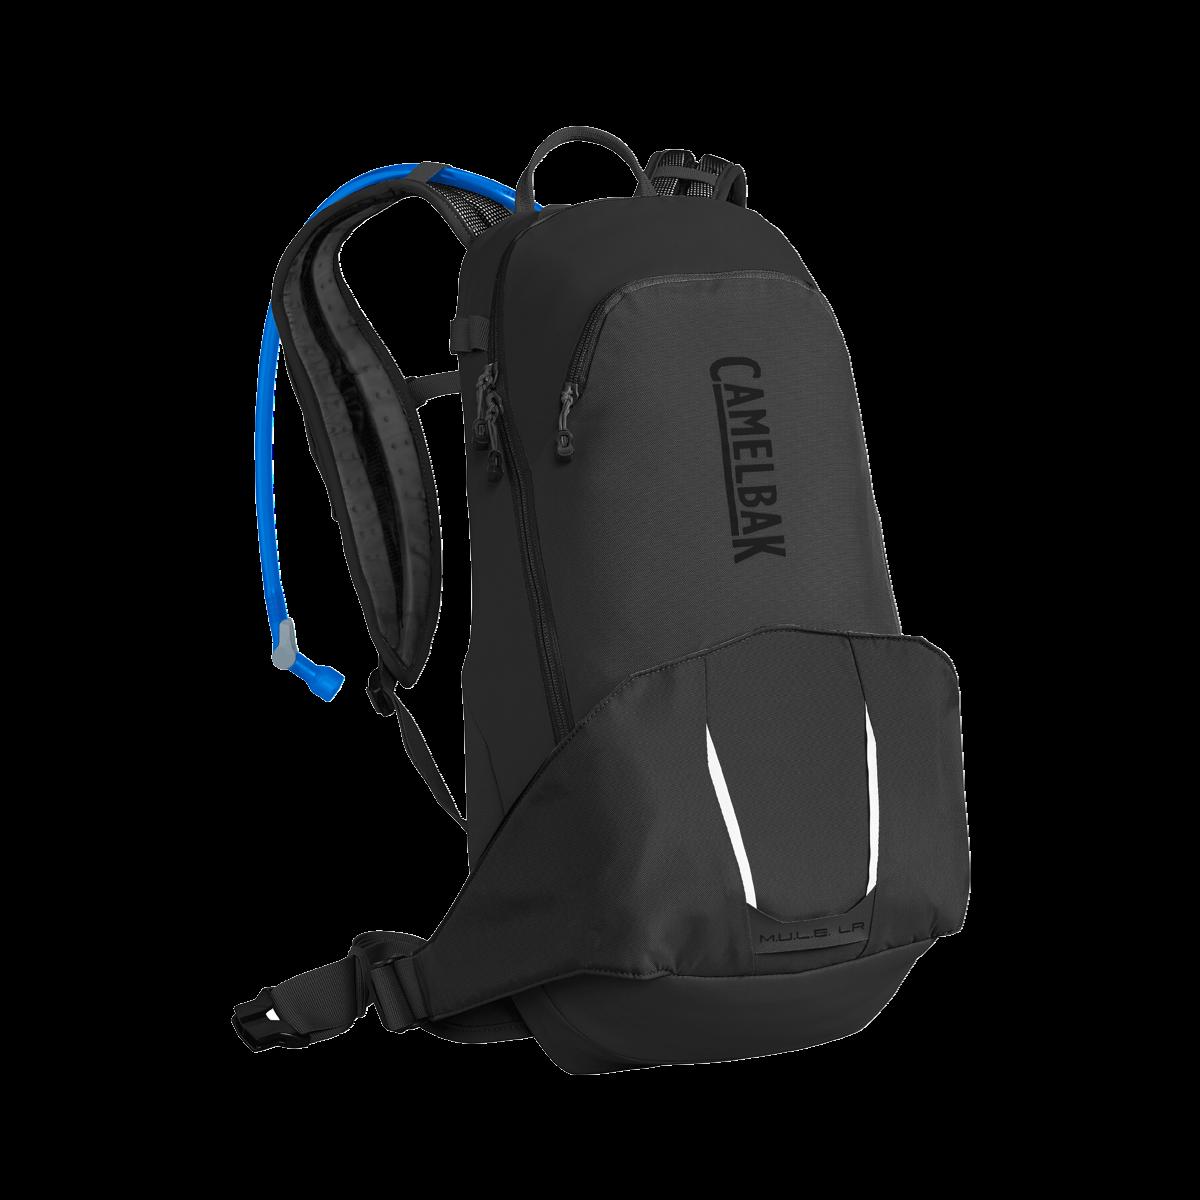 Camelbak MULE LR 15 Hydration Pack - 2019